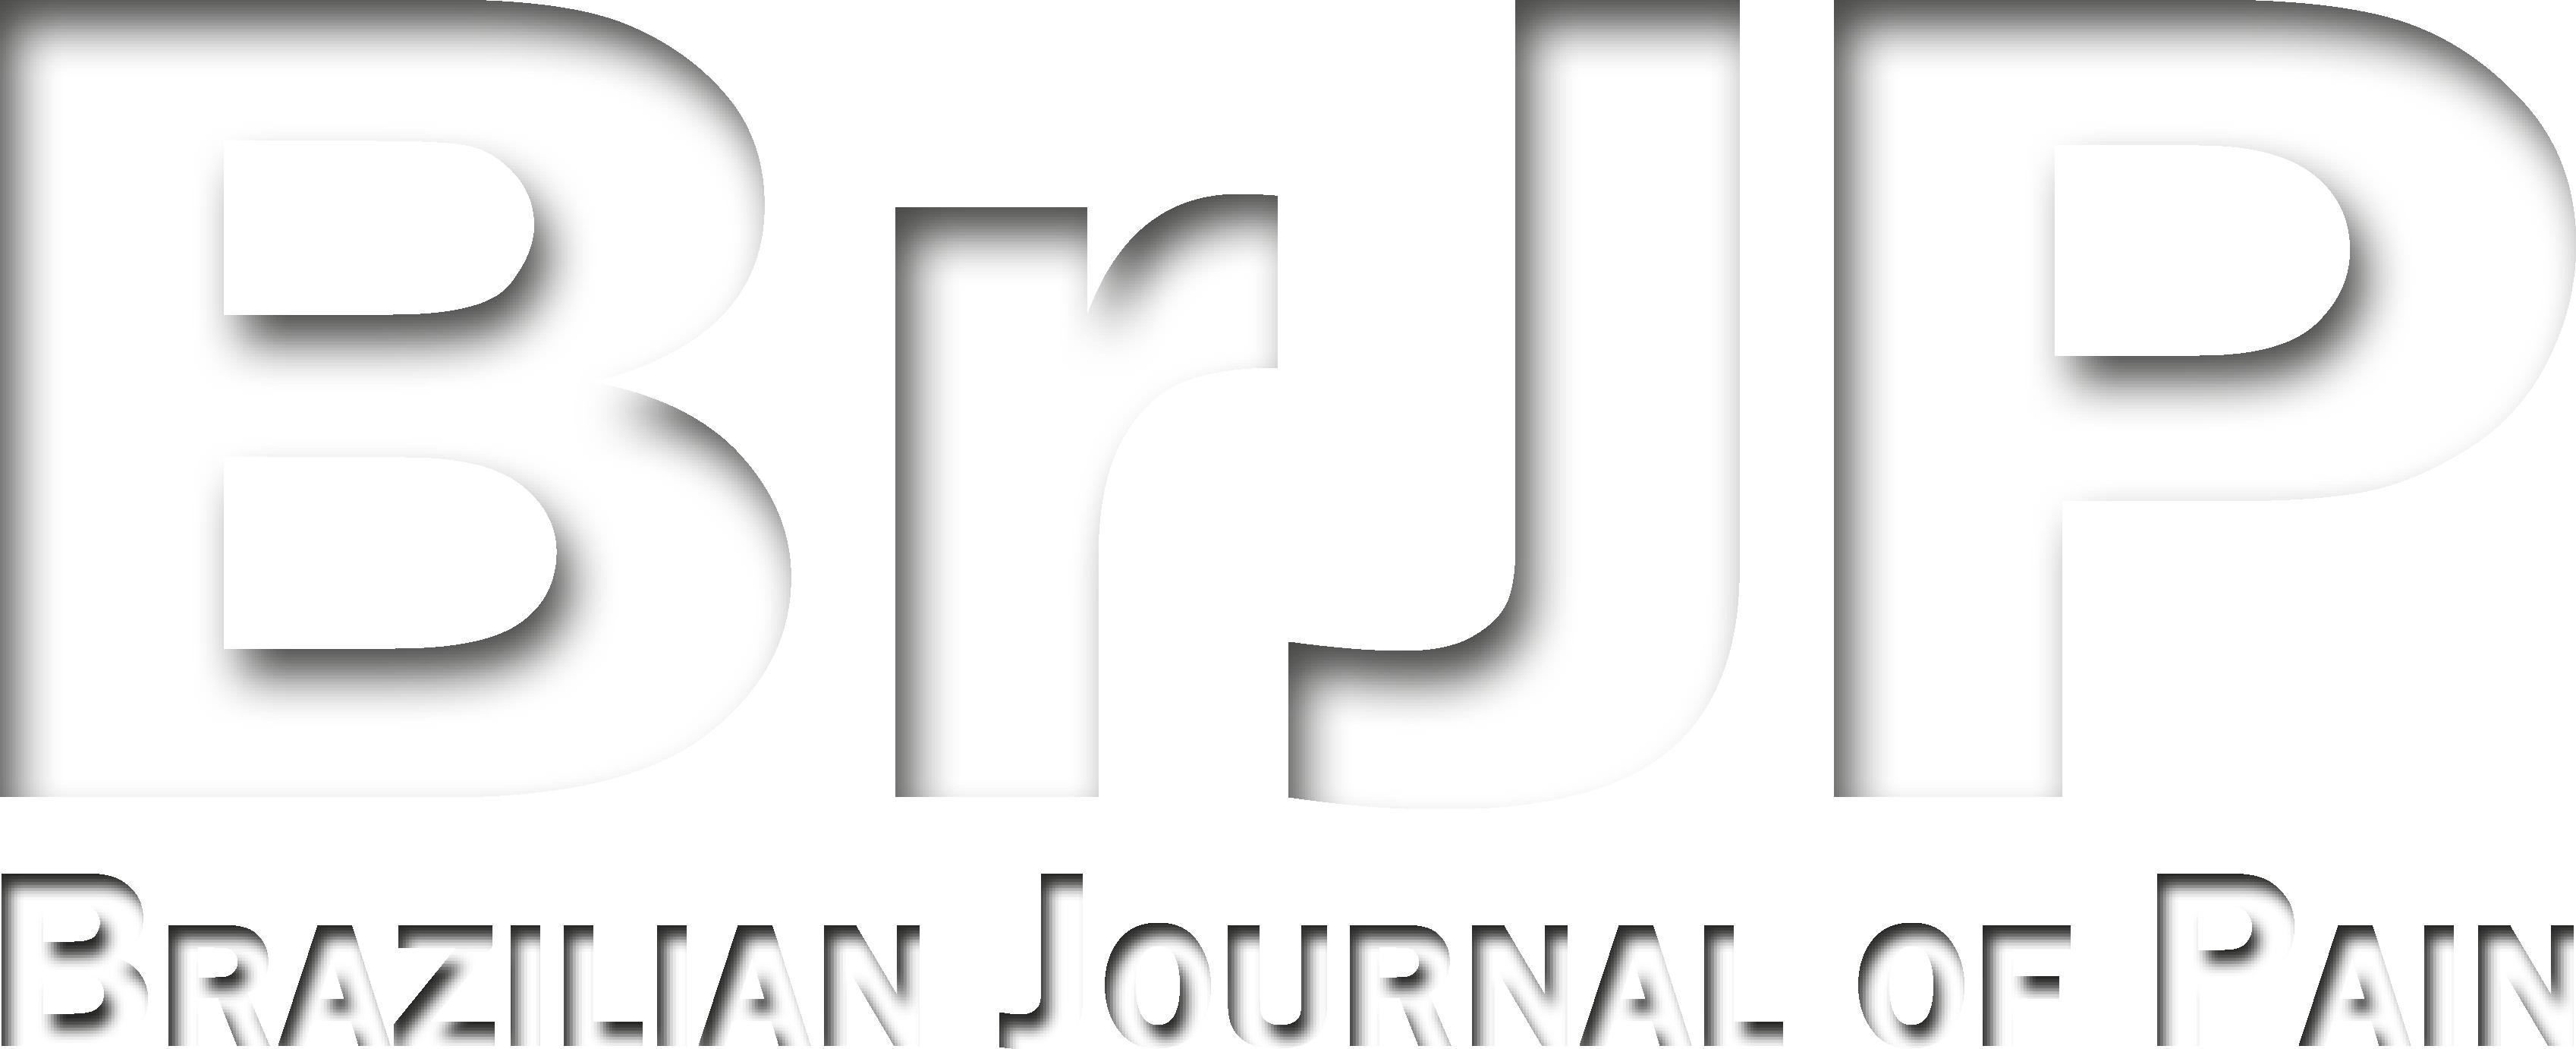 Brazilian Journal of Pain